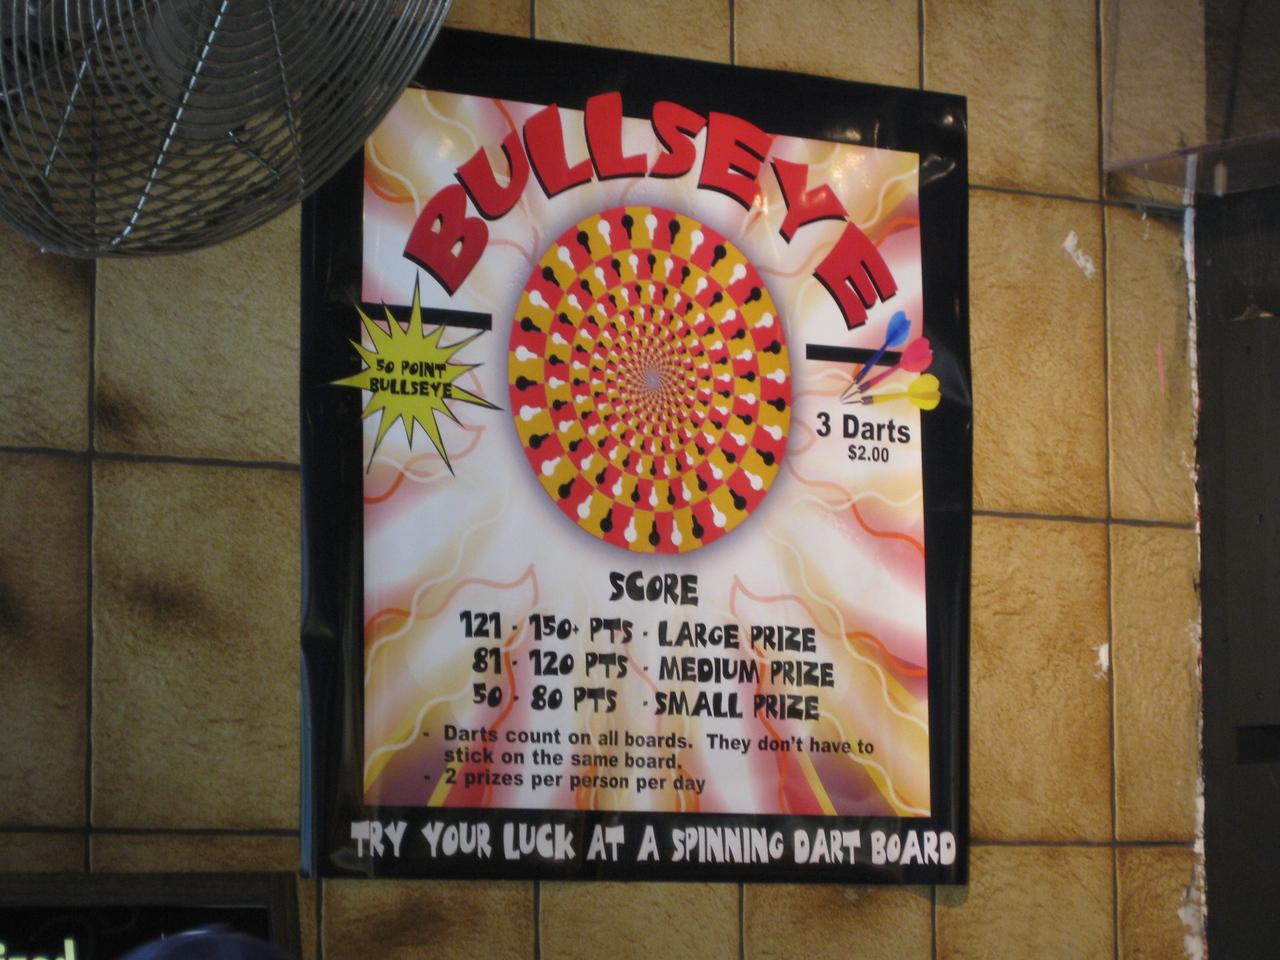 This sign says Bullseye.